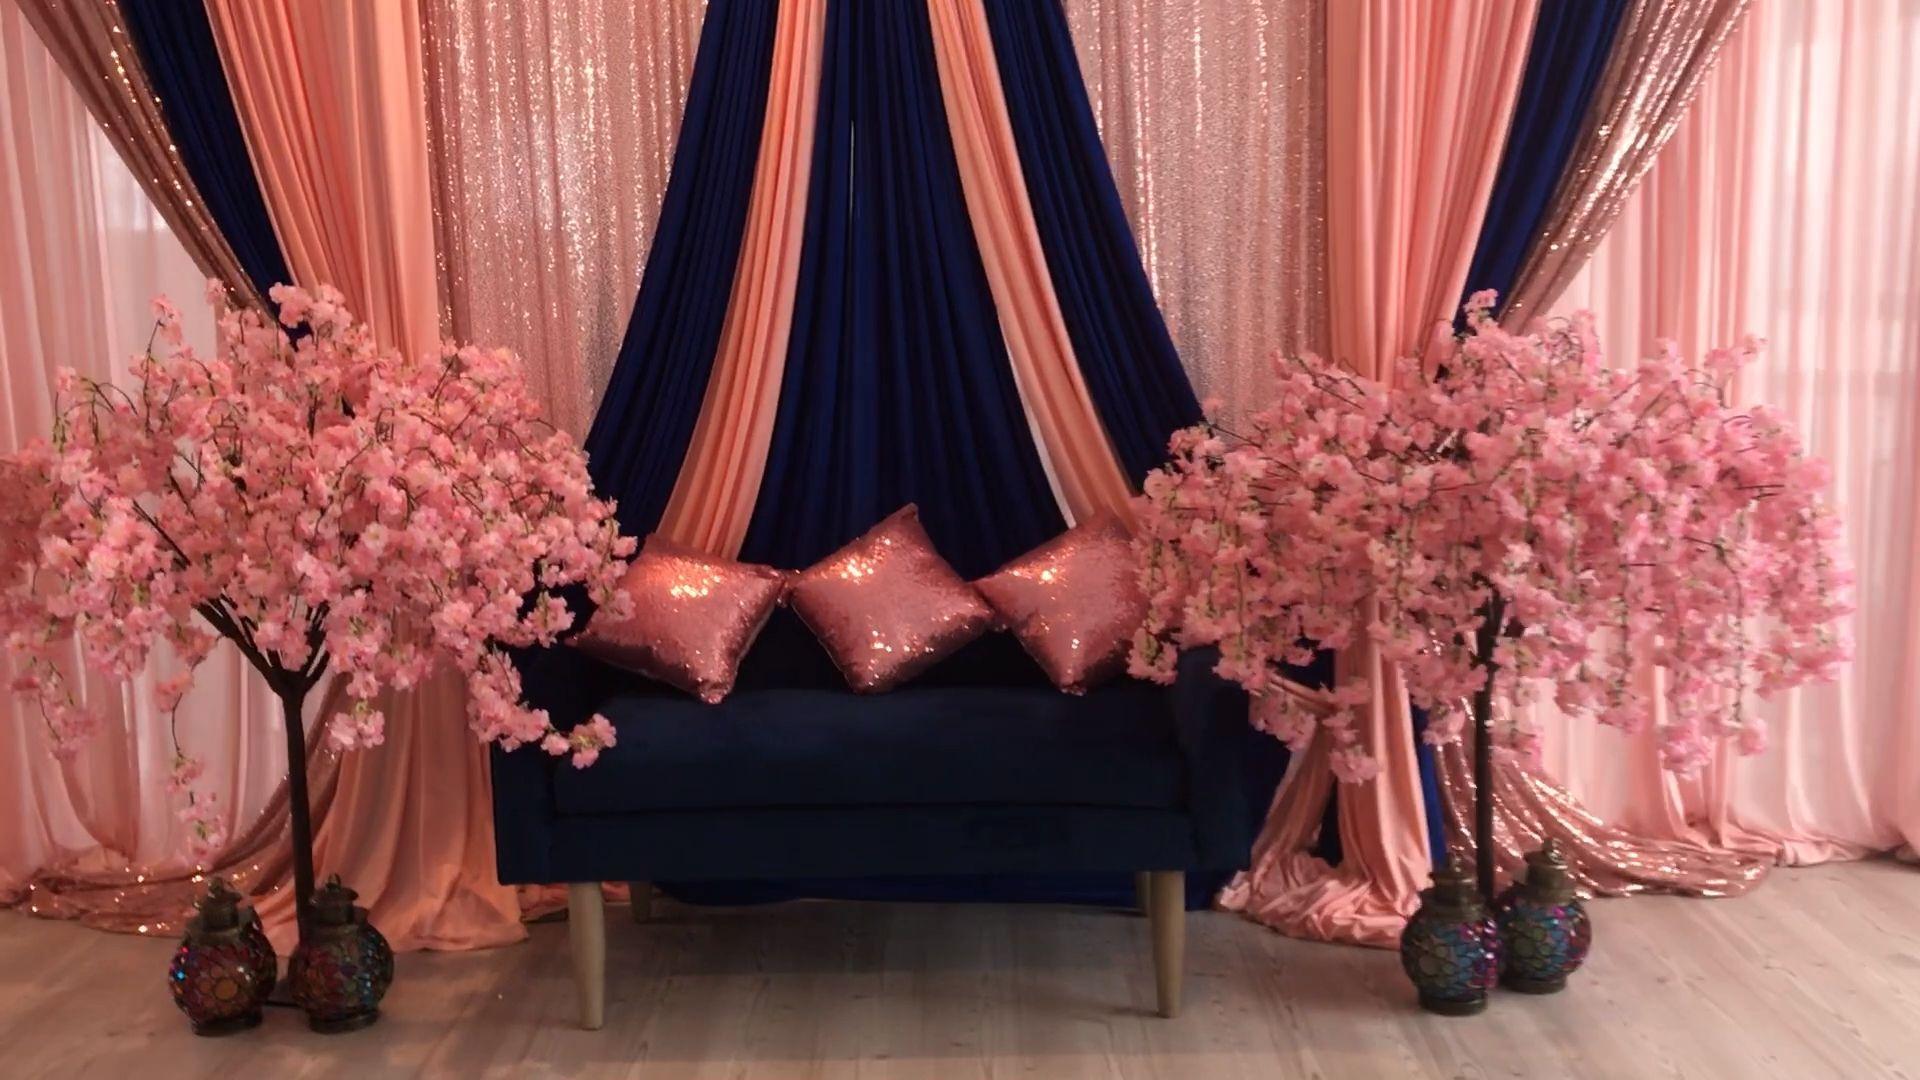 DIY- stage Decor #backdrop#decor #diy #stage in 2020 | Diy wedding  backdrop, Wedding backdrop design, Stage decorations